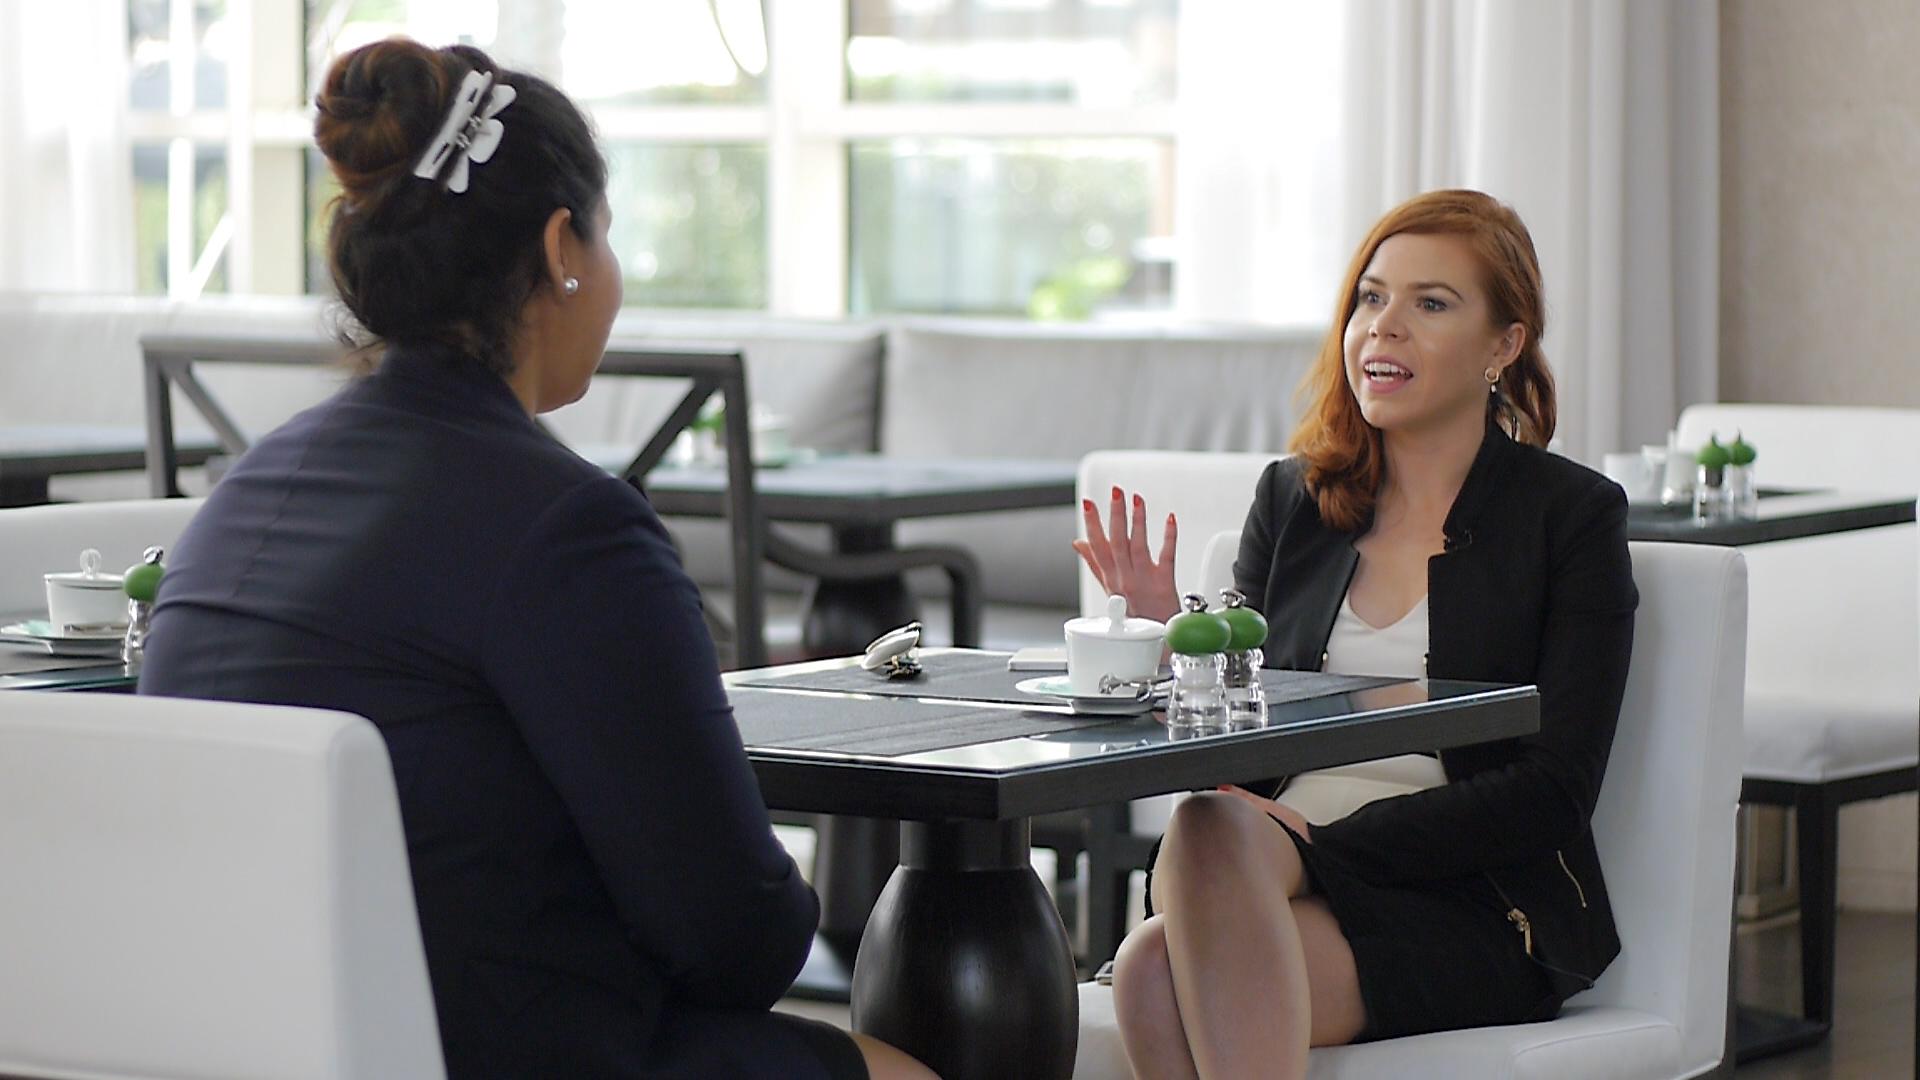 how to run a business meeting - briar prestidge - deals in high heels